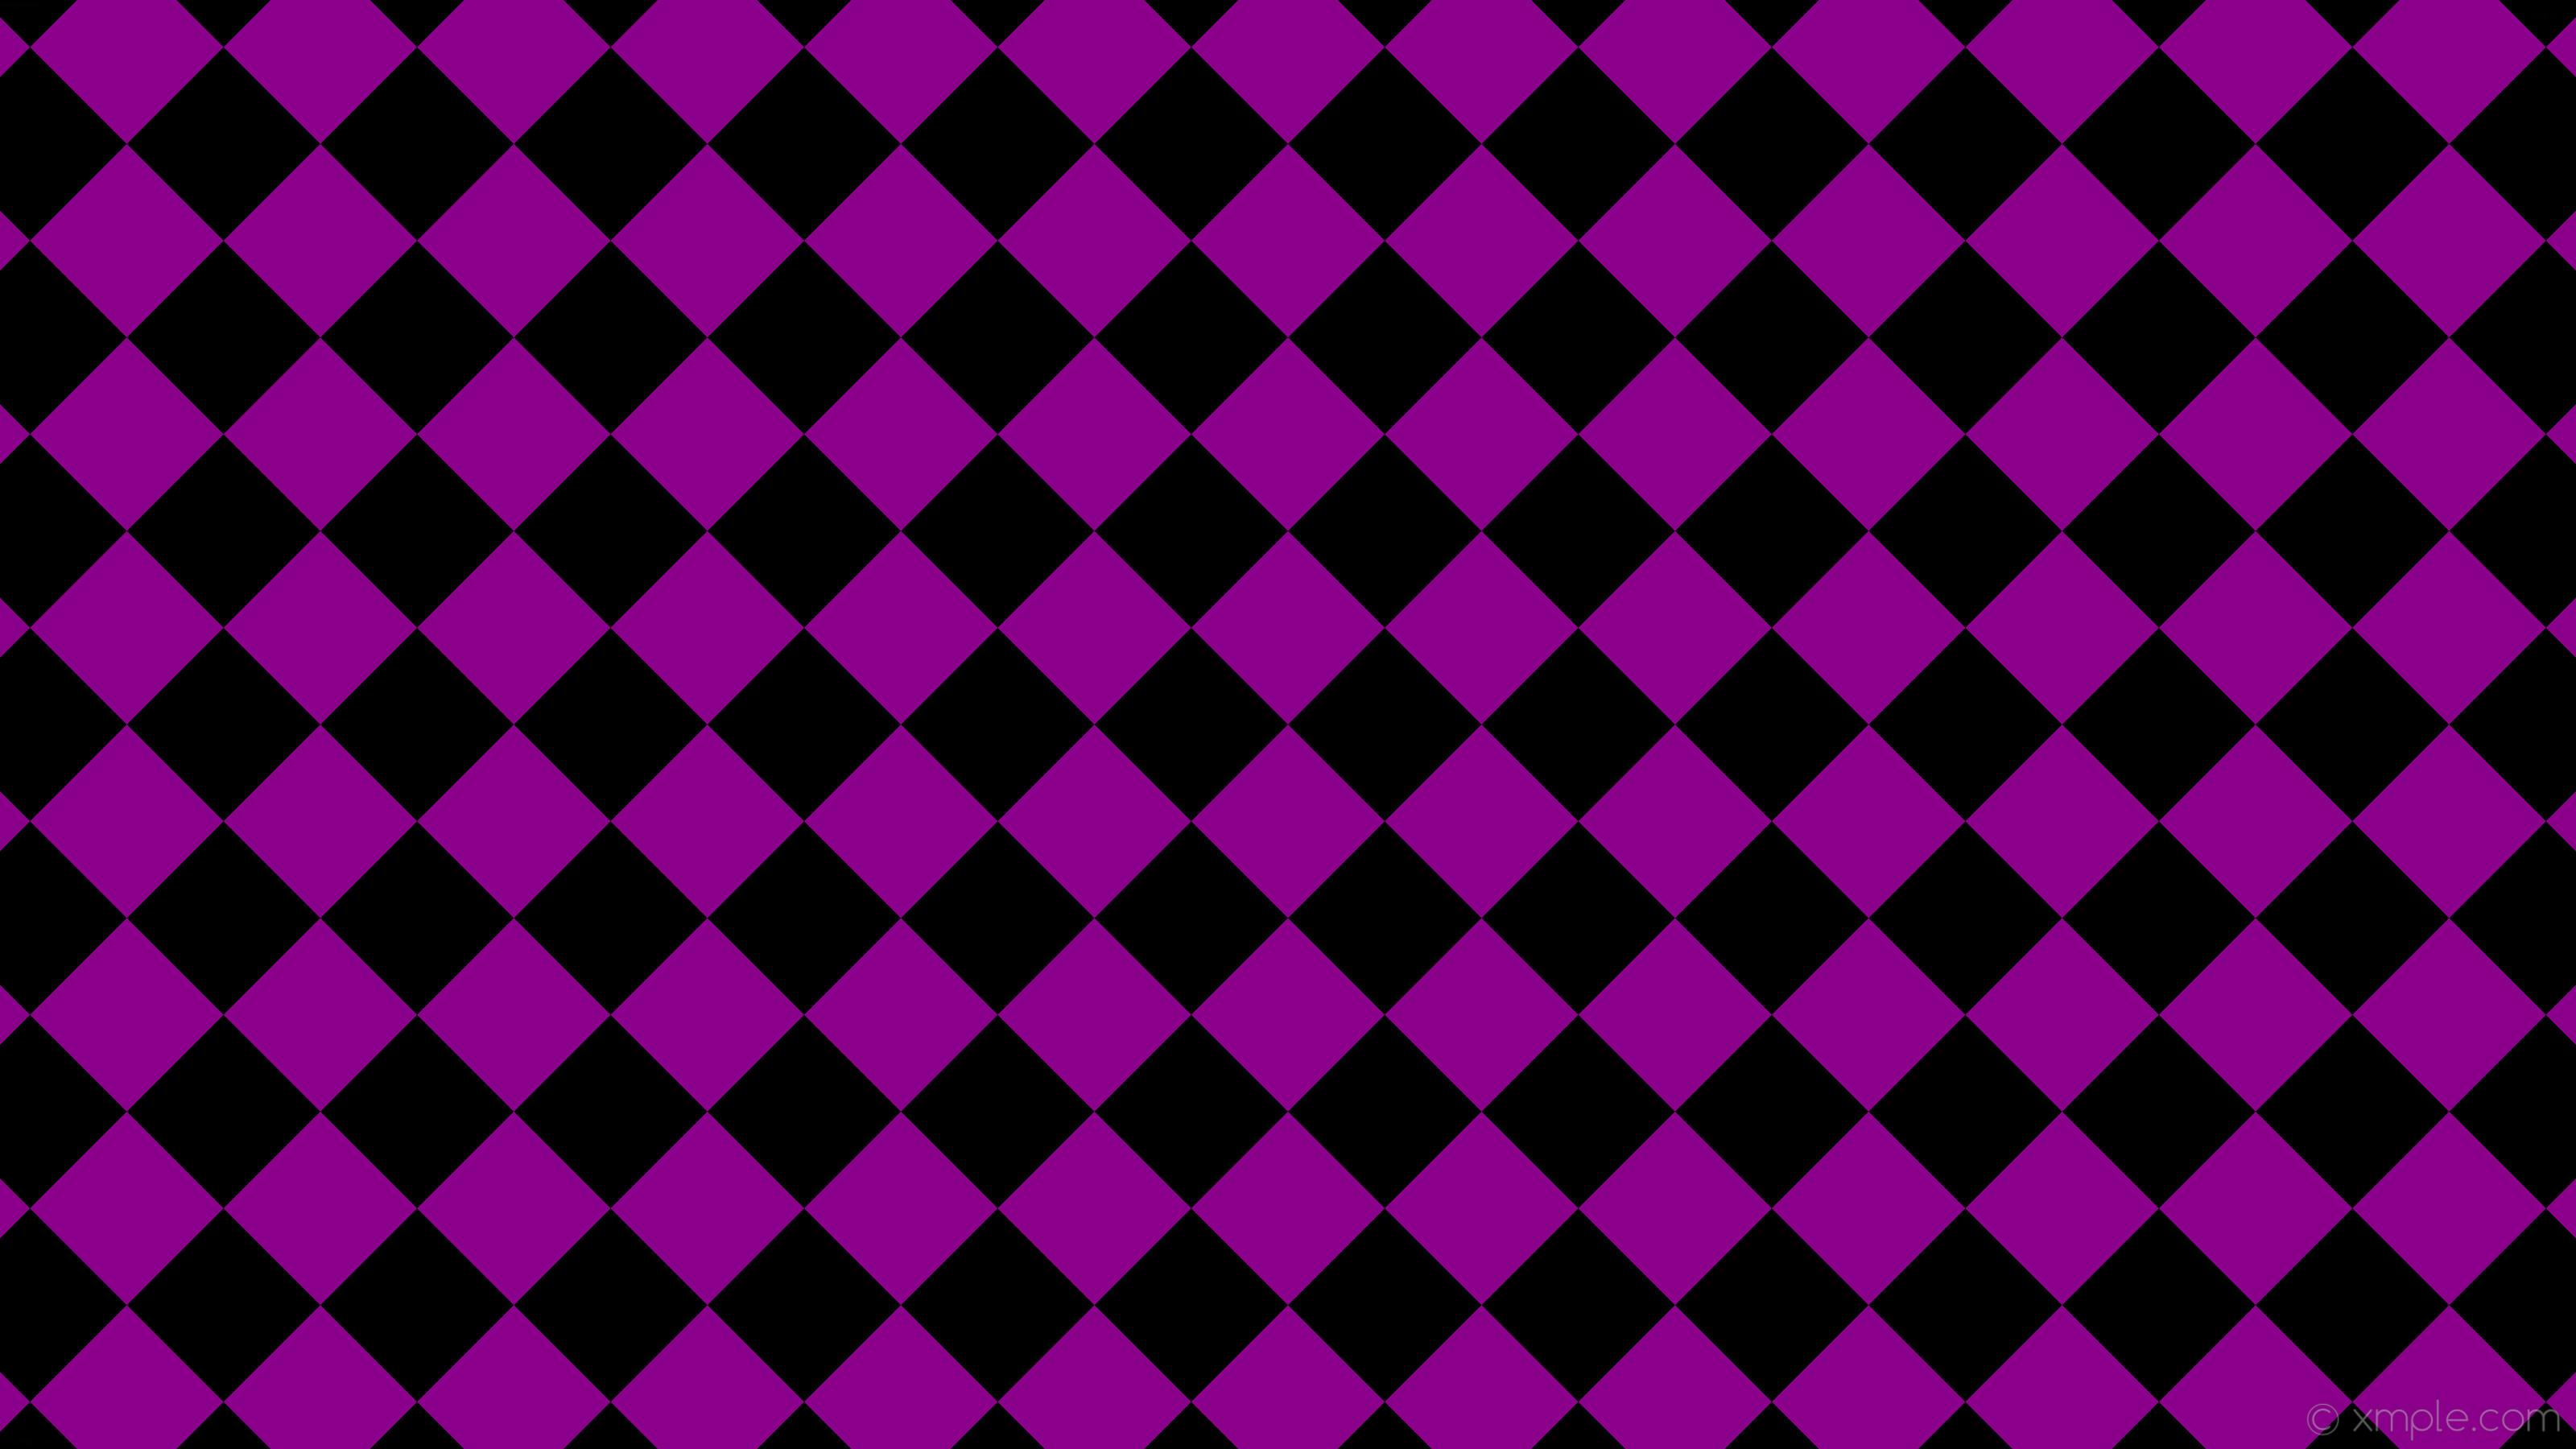 wallpaper checkered black purple squares dark magenta #000000 #8b008b  diagonal 45° 170px